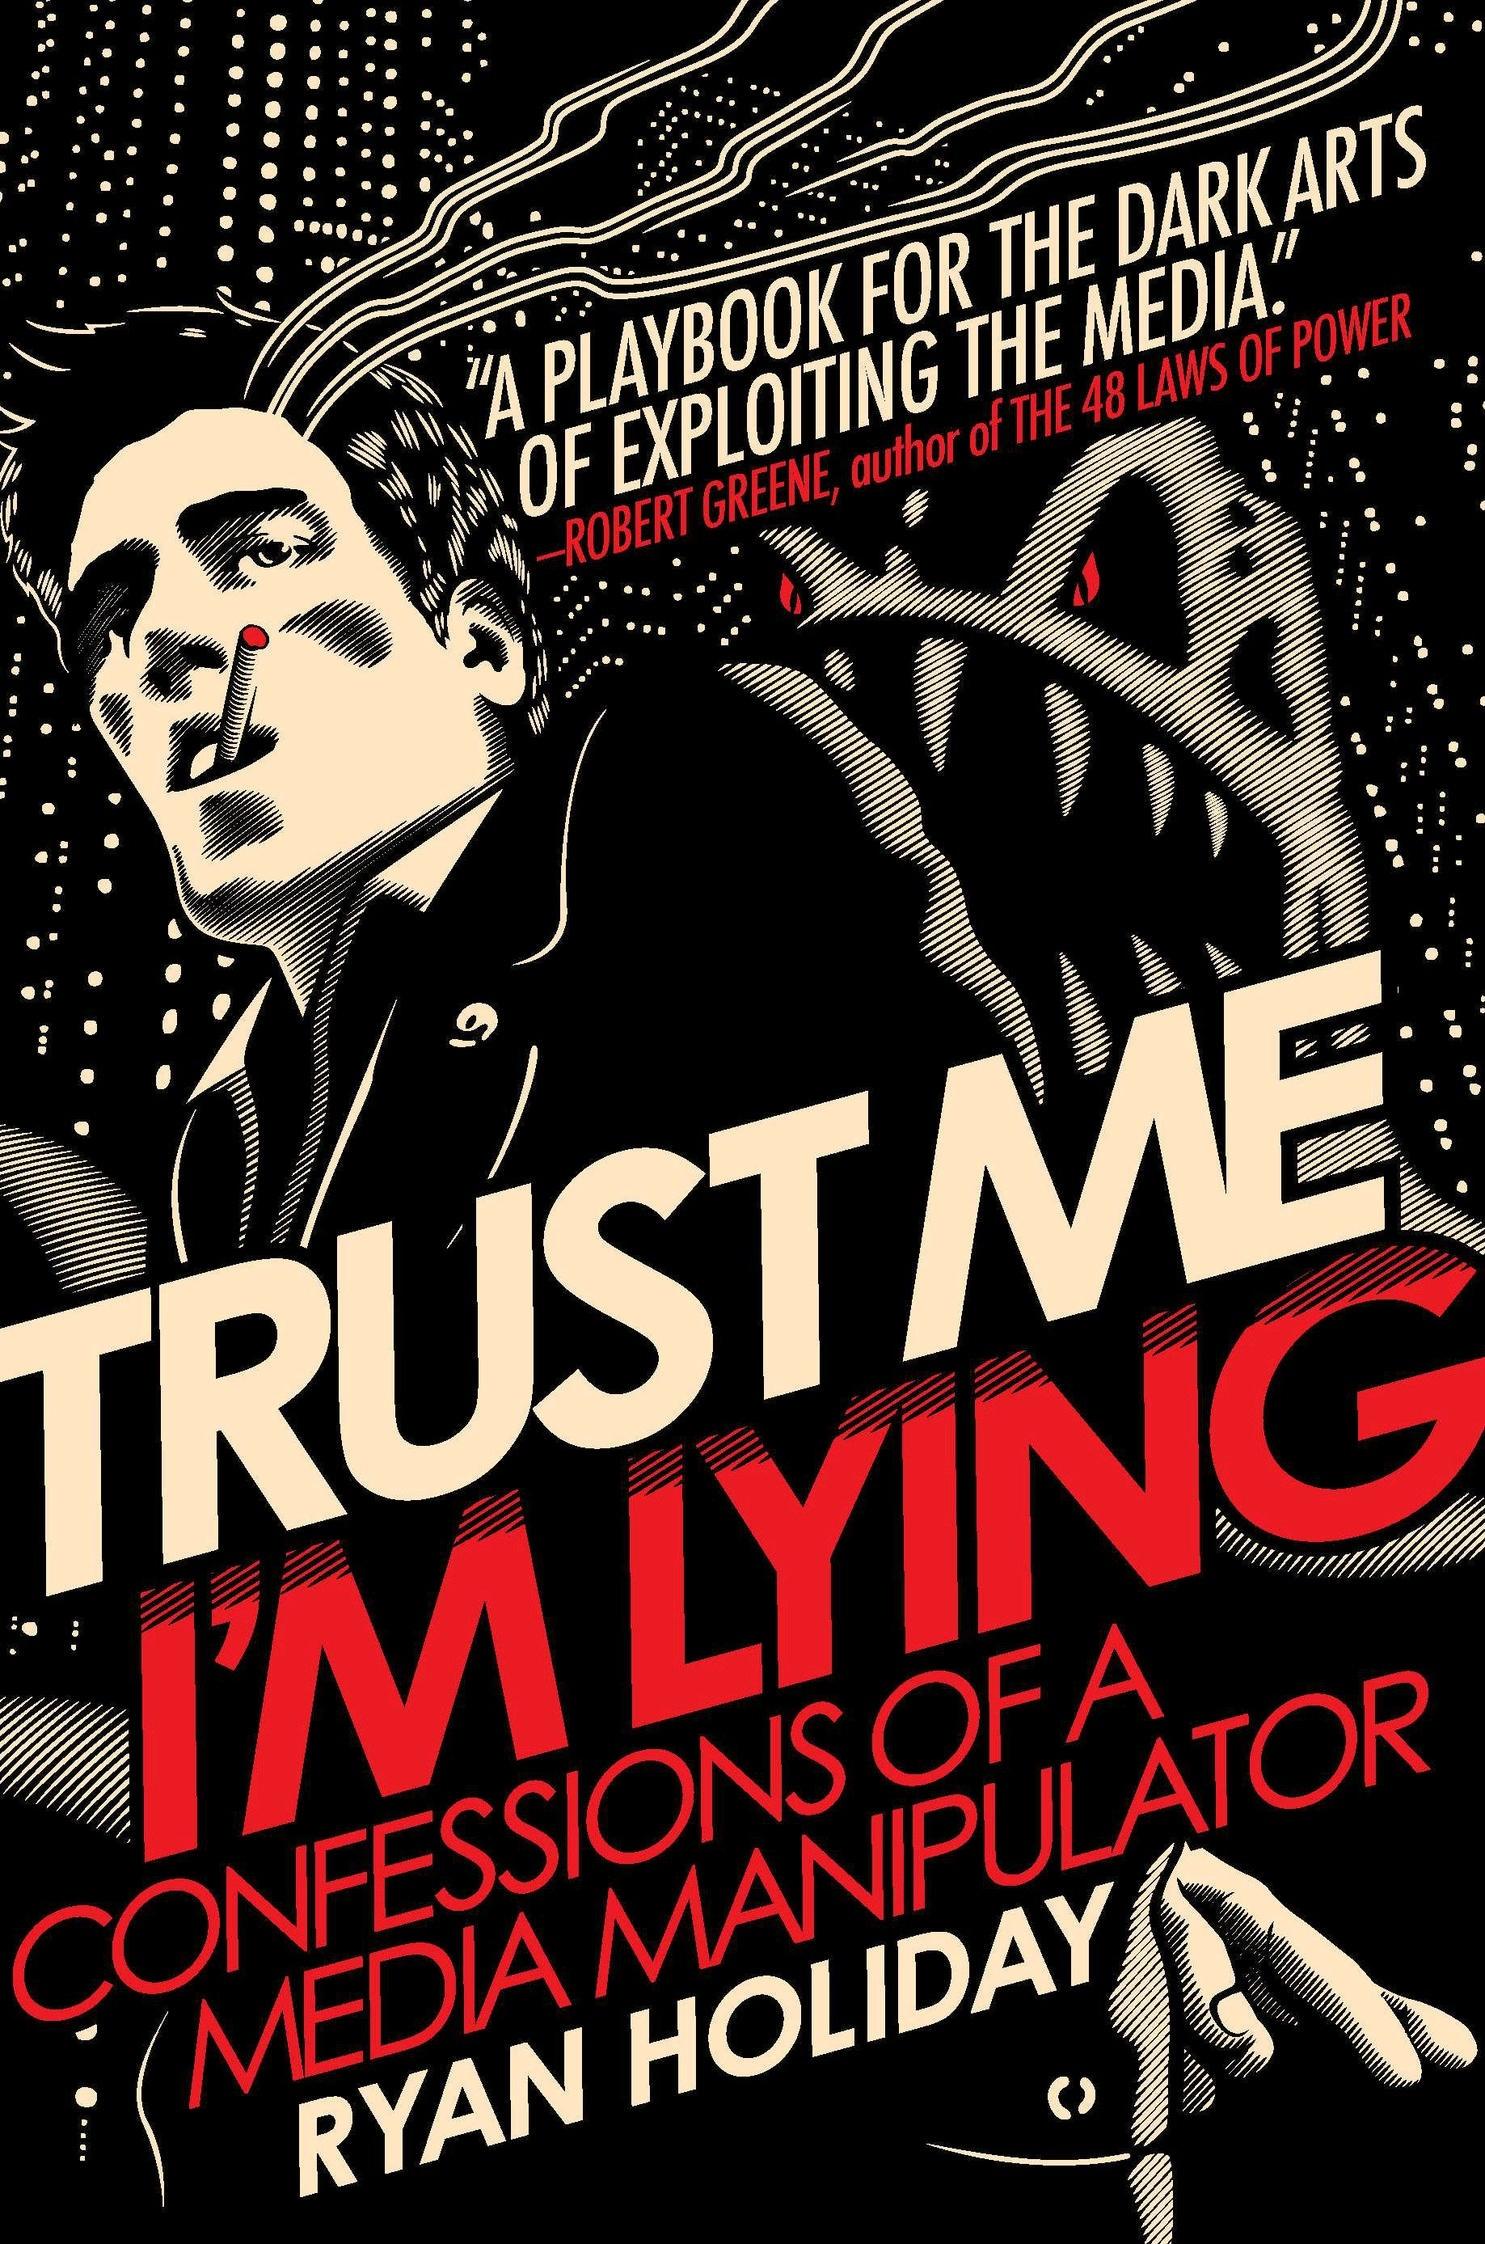 Trust-me-Im-Lying-Cover.jpg  9 Marketing Books to Read Before Q1 Ends Trust me Im Lying Cover